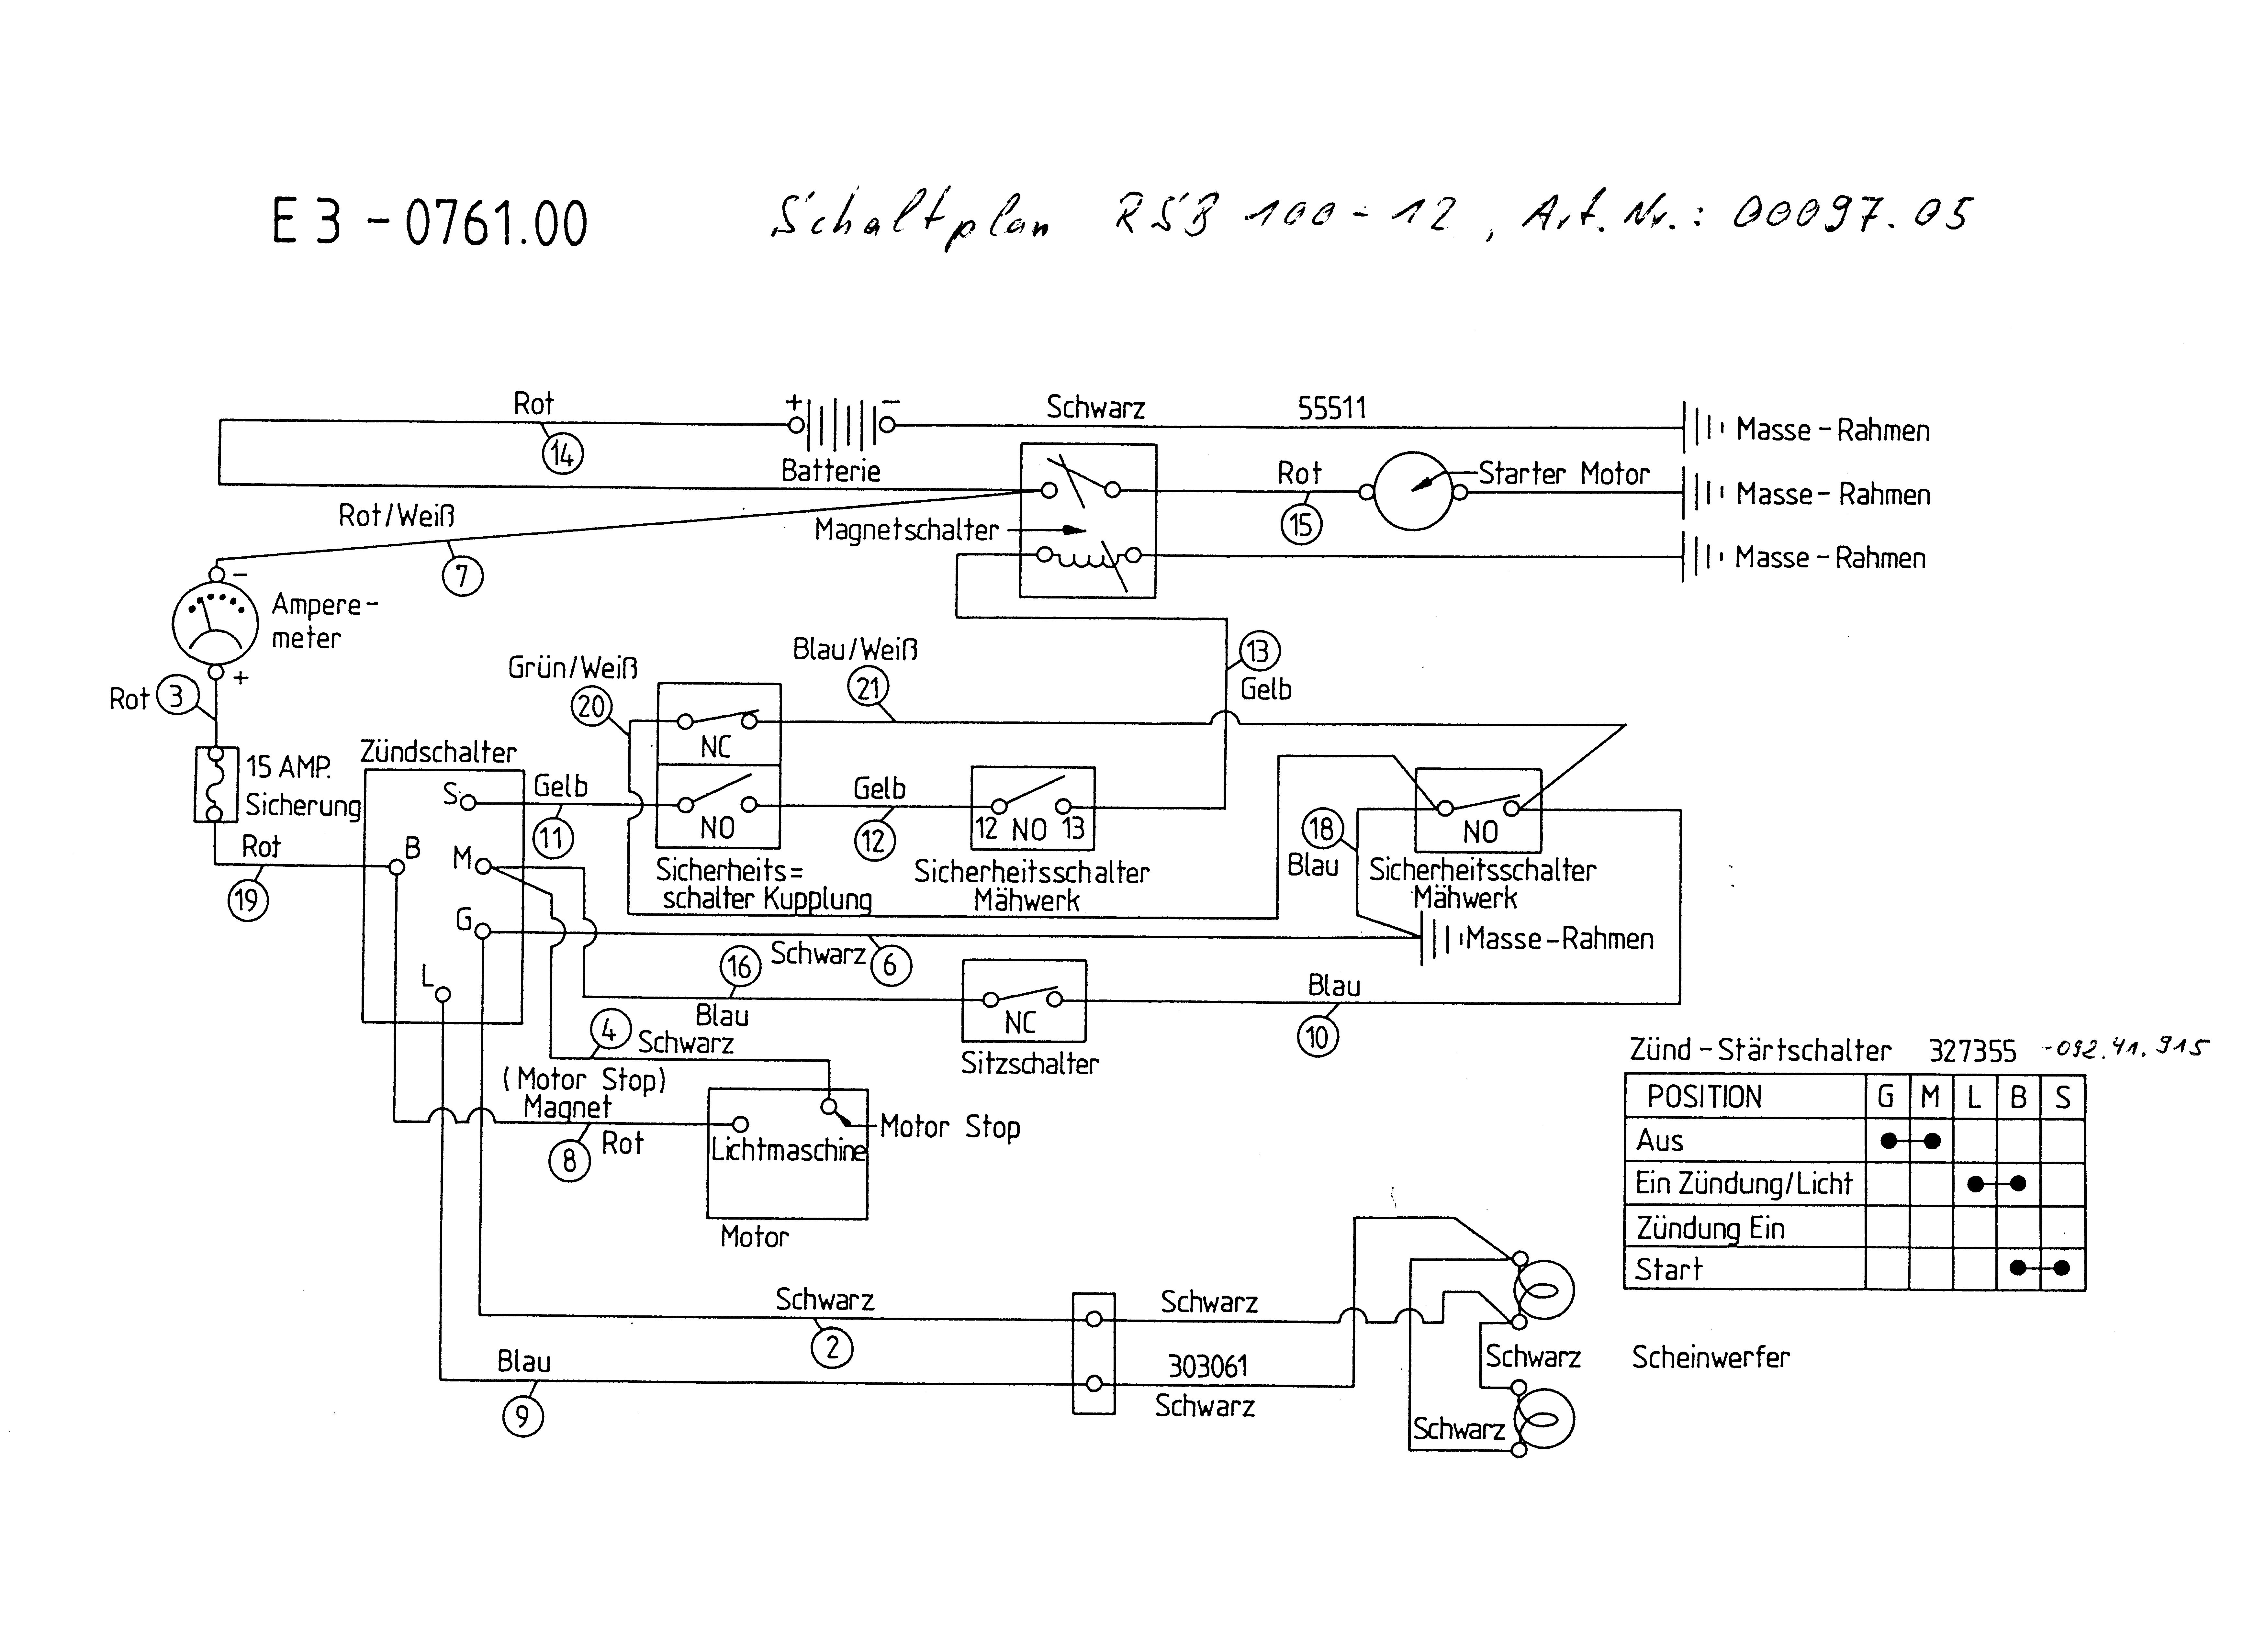 Gutbrod RSB 100-12 Schaltplan 00097.05 (1995)